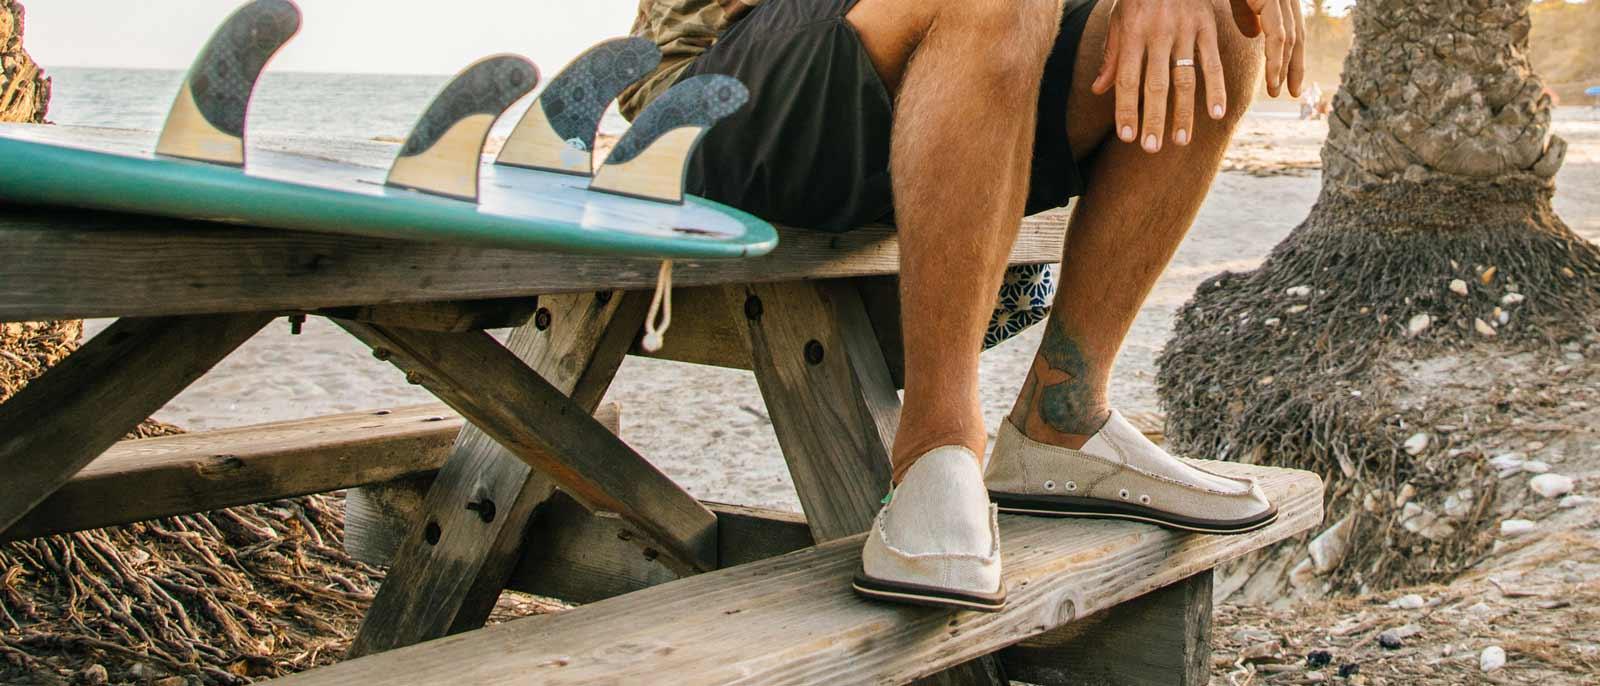 Man sitting on park bench next to his surfboard, wearing Sanuks